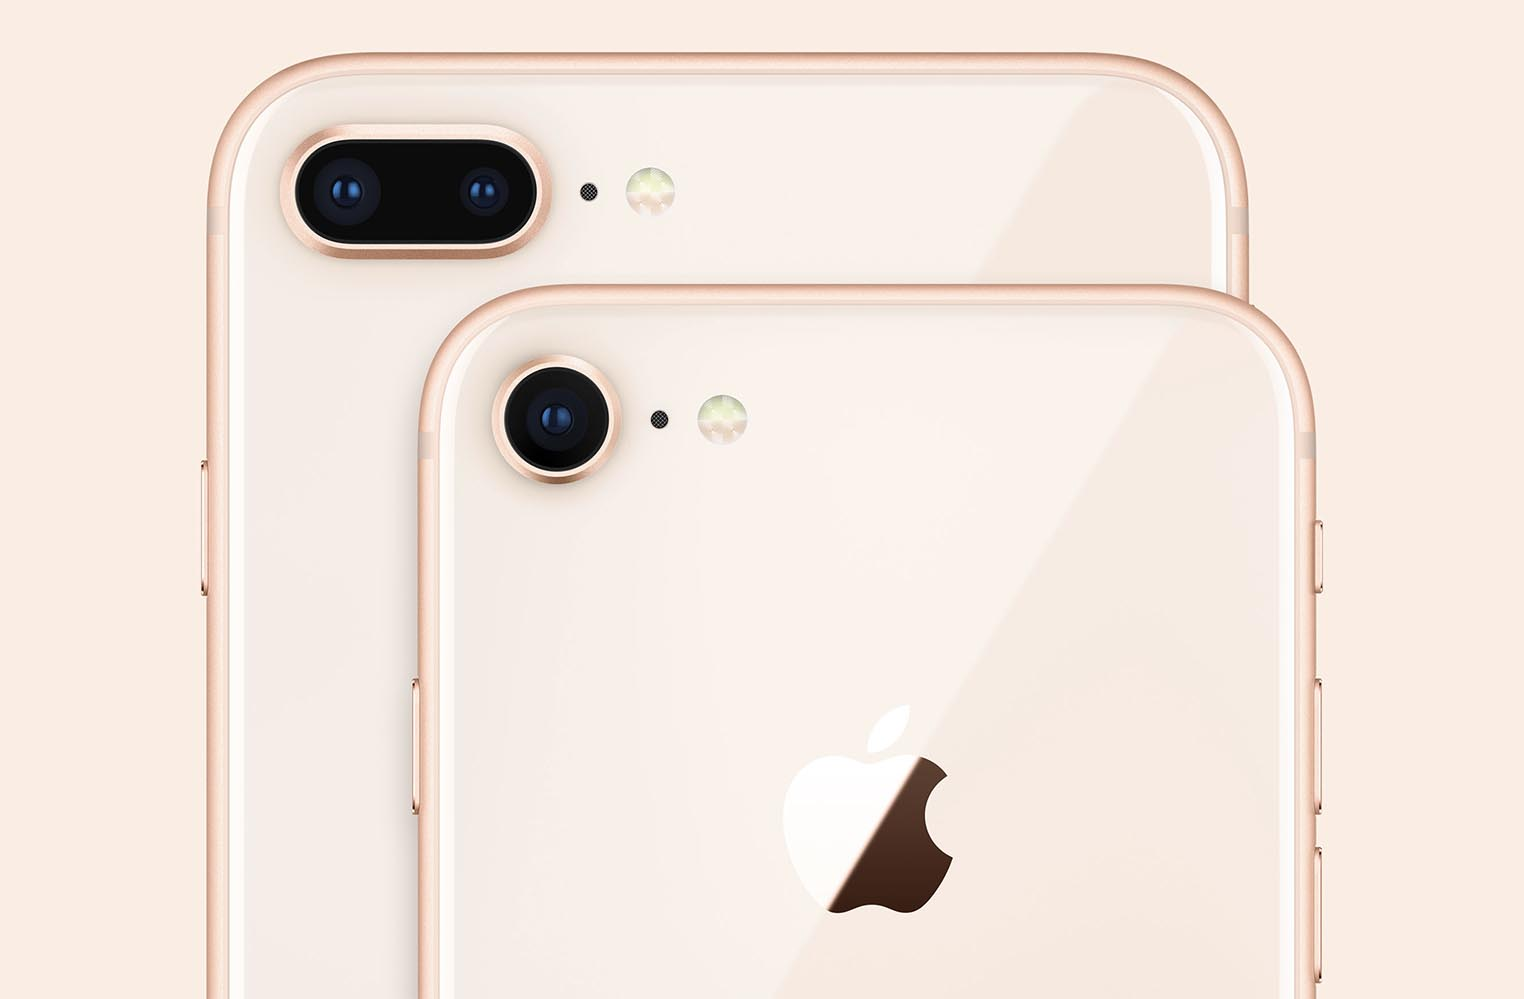 iPhone 8 appareils photos